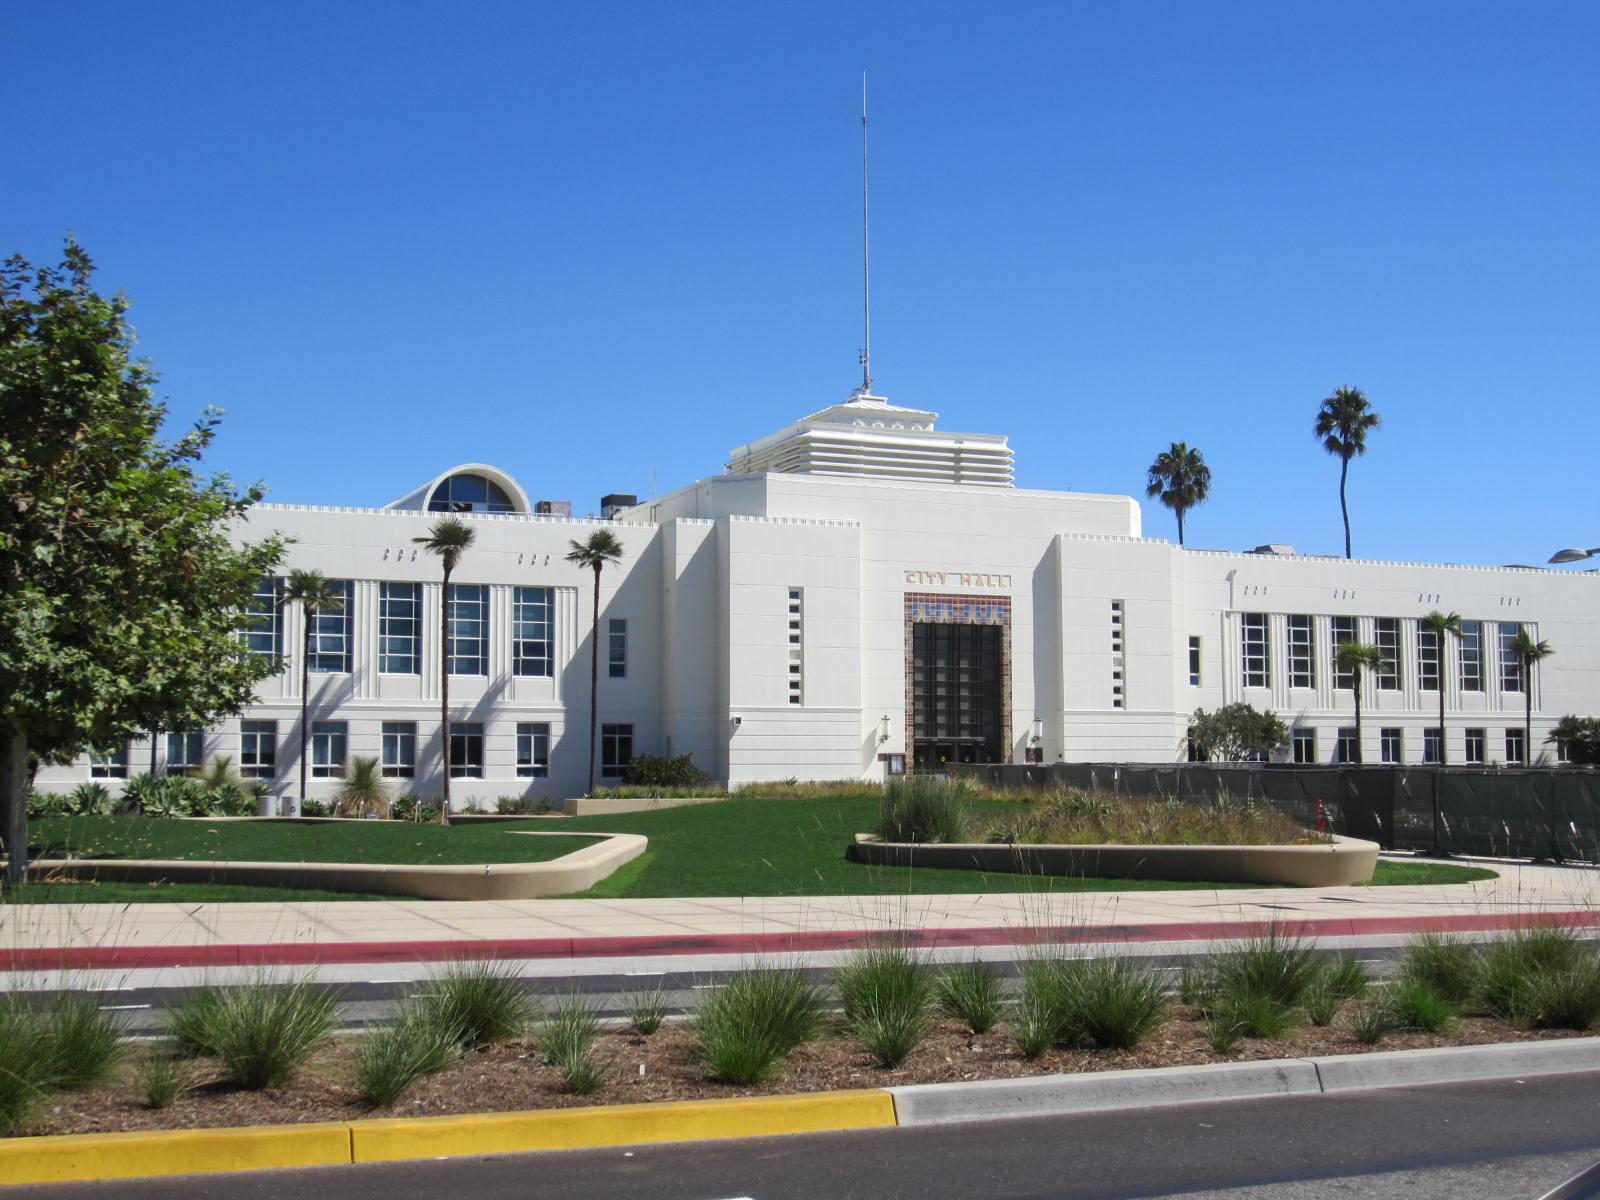 Santa Monica City Hall, 1939, Parkinson & Estep